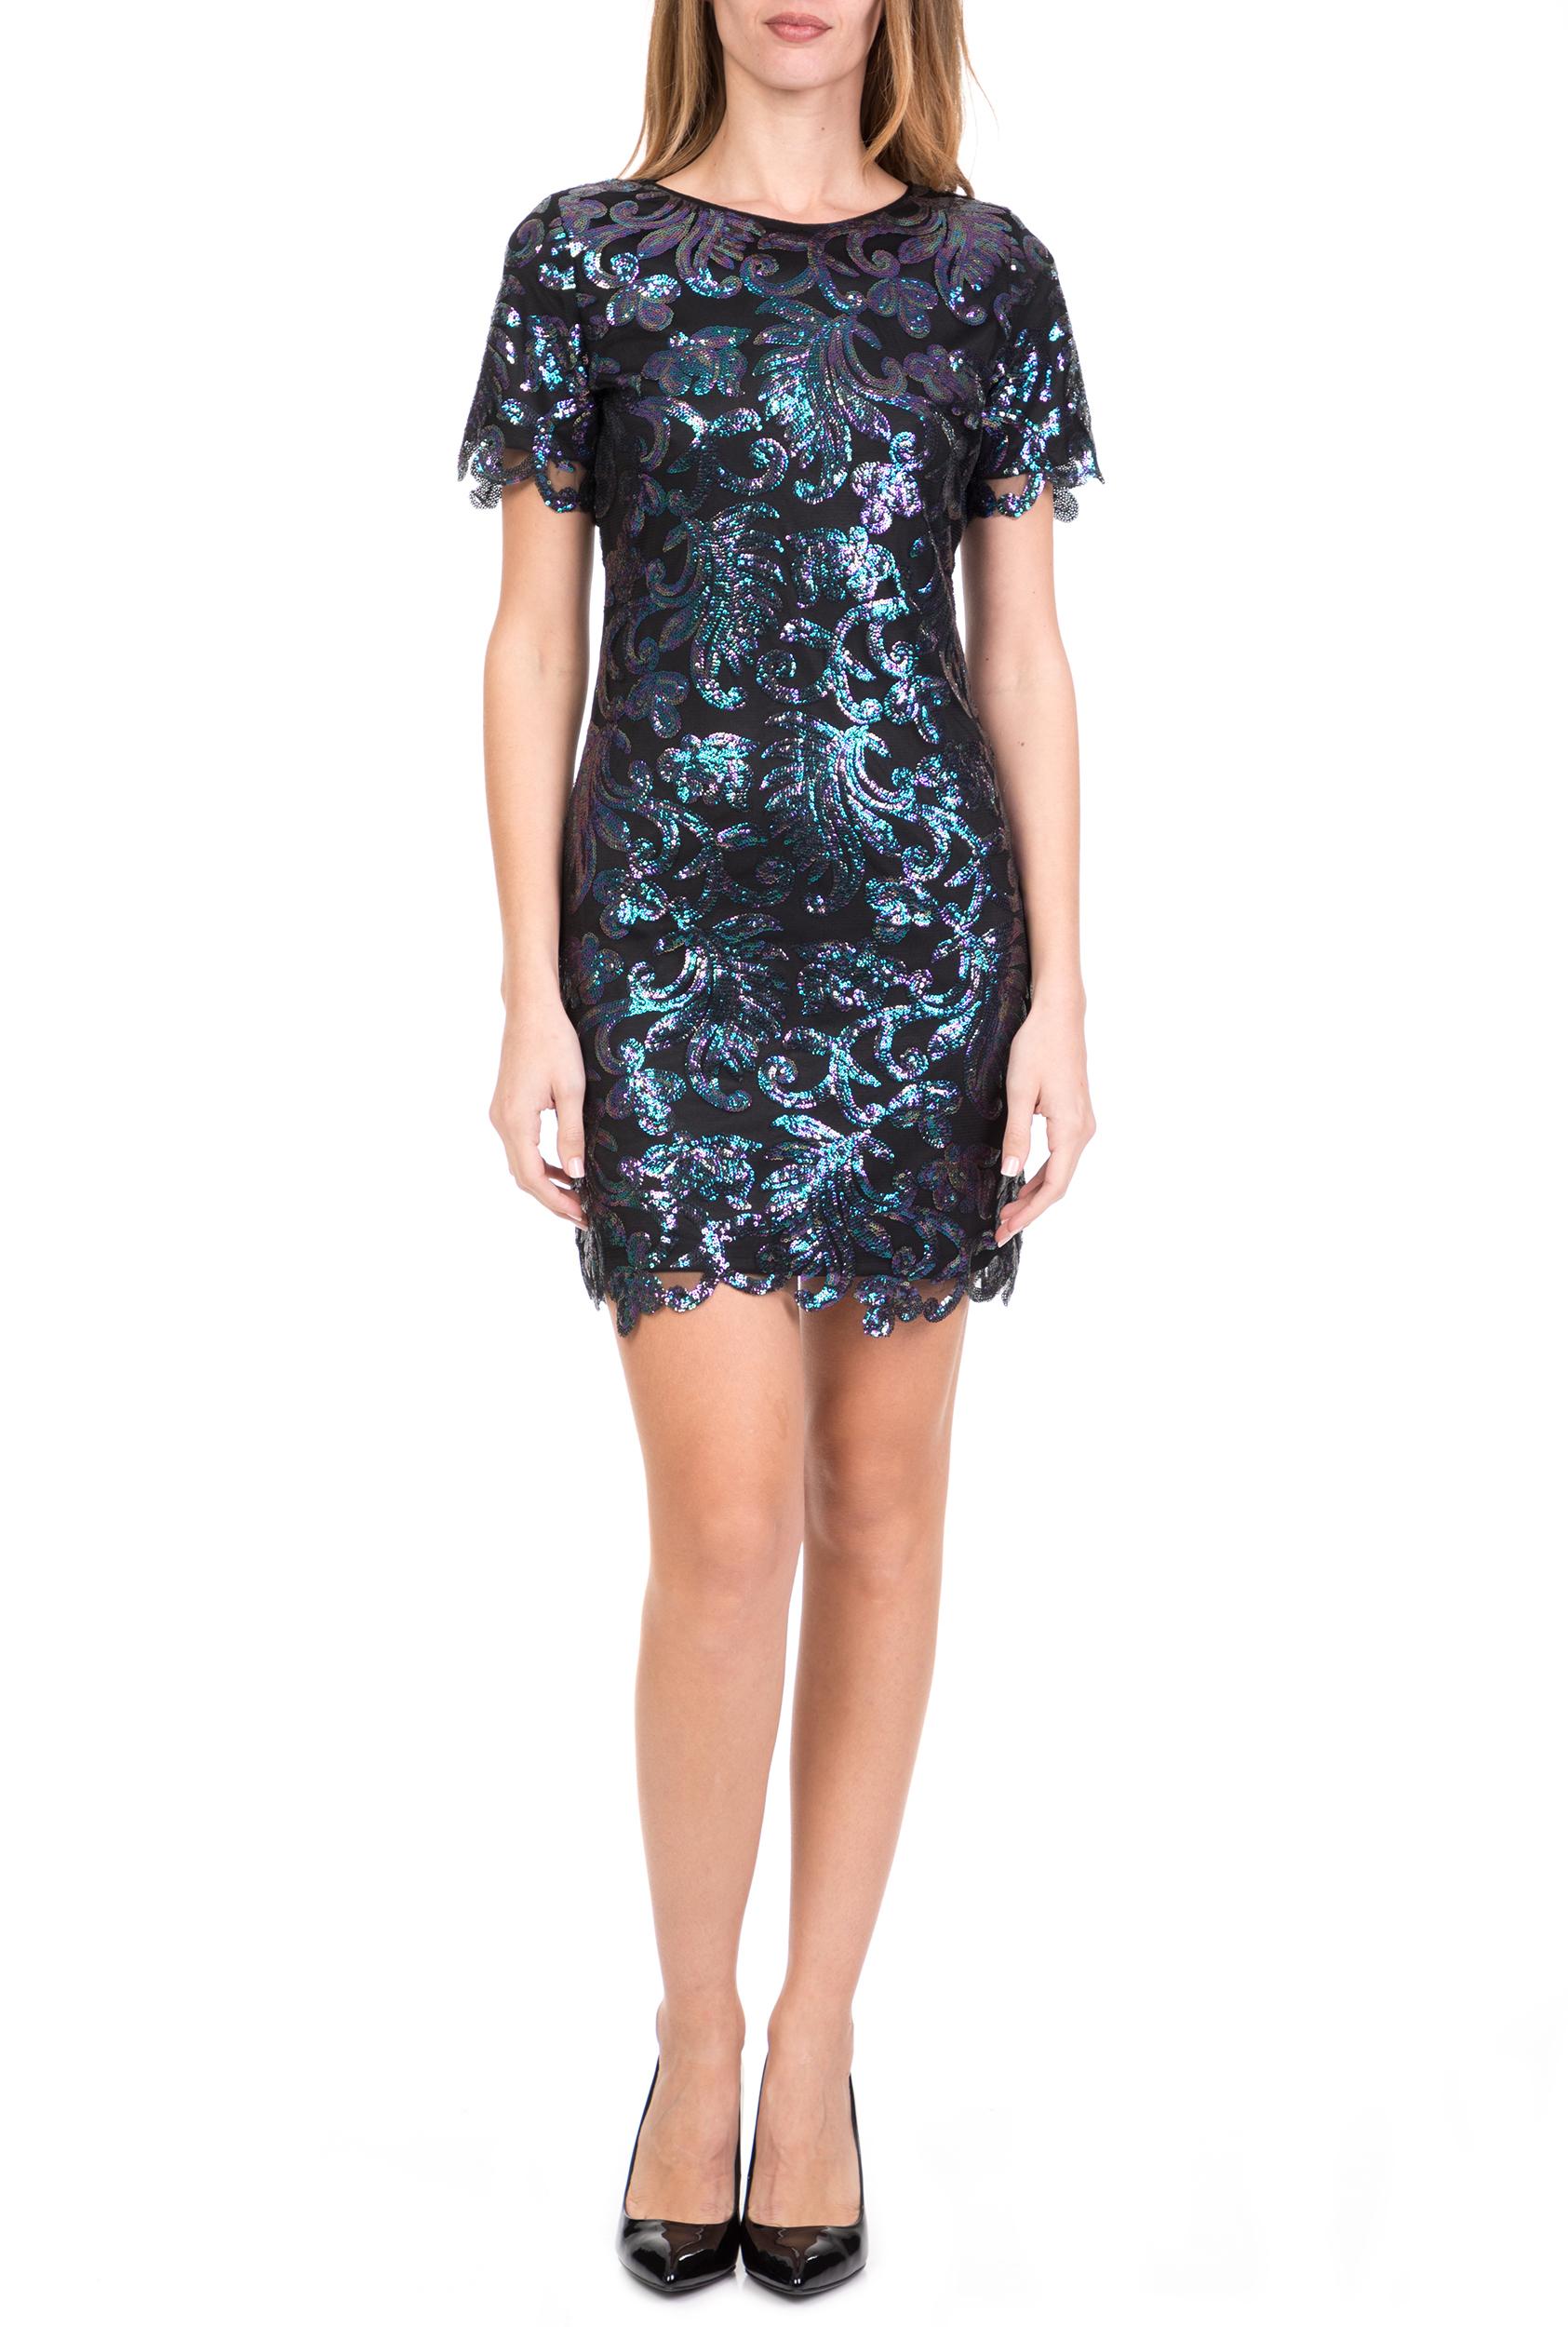 fcea449c6b88 MOLLY BRACKEN - Γυναικεία Φορέματα - Ακριβότερα Προϊόντα - Σελίδα 2 ...